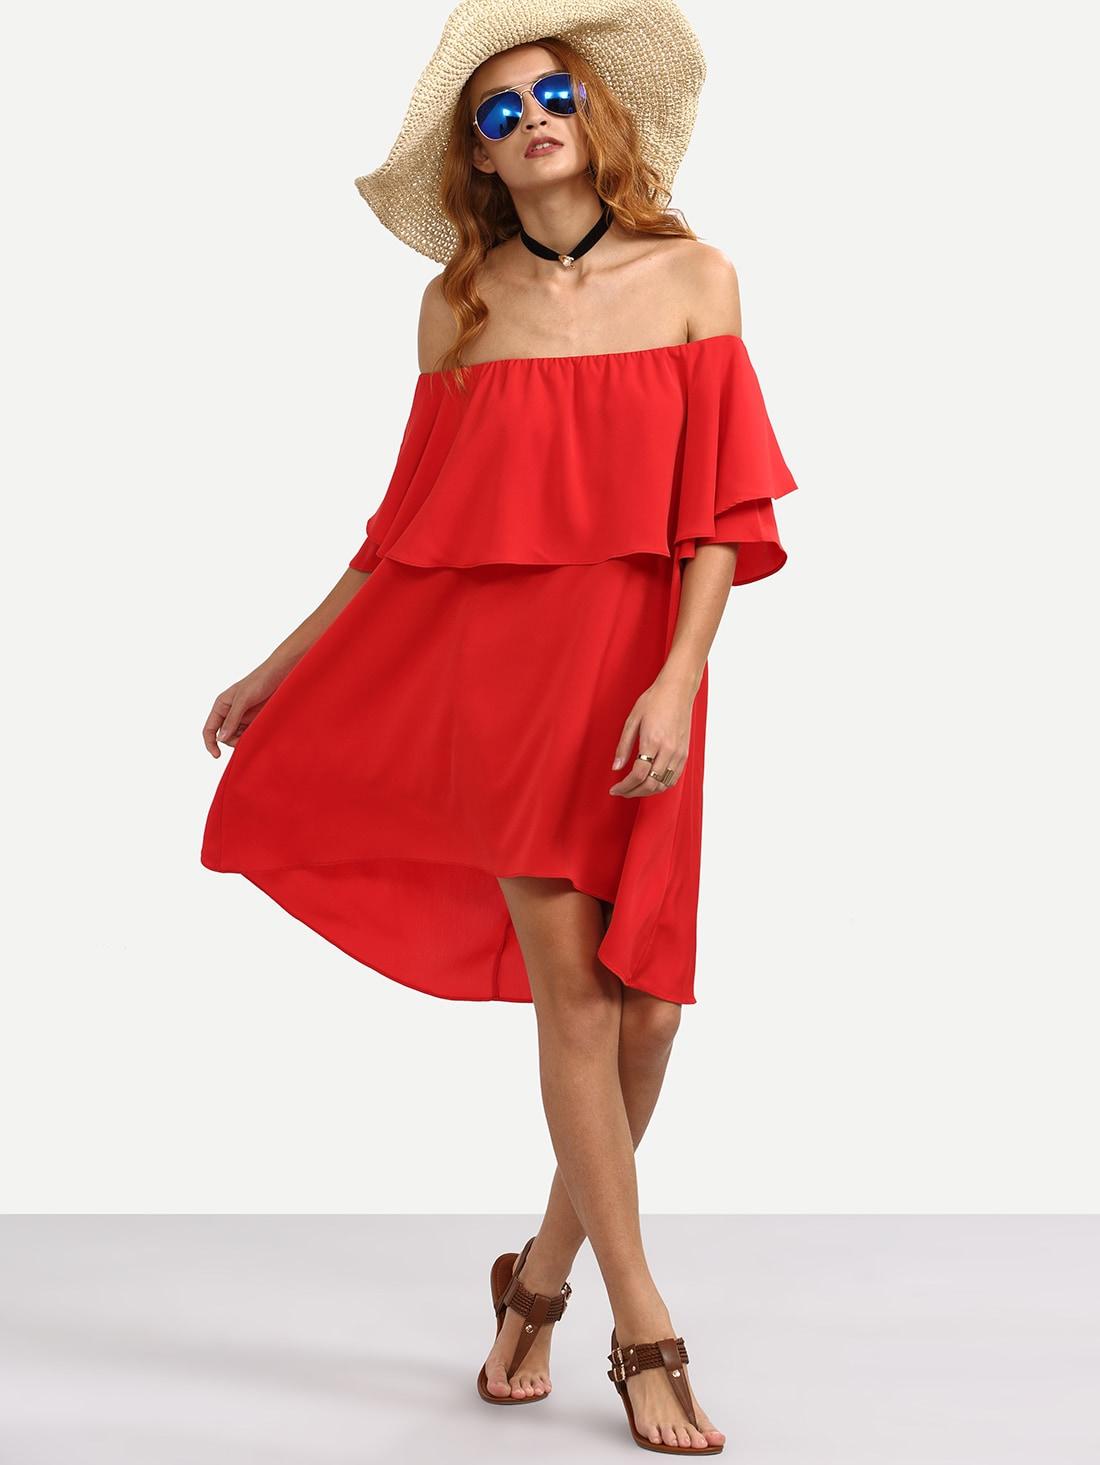 Flounce Layered Neckline Chiffon Dress dress160531502